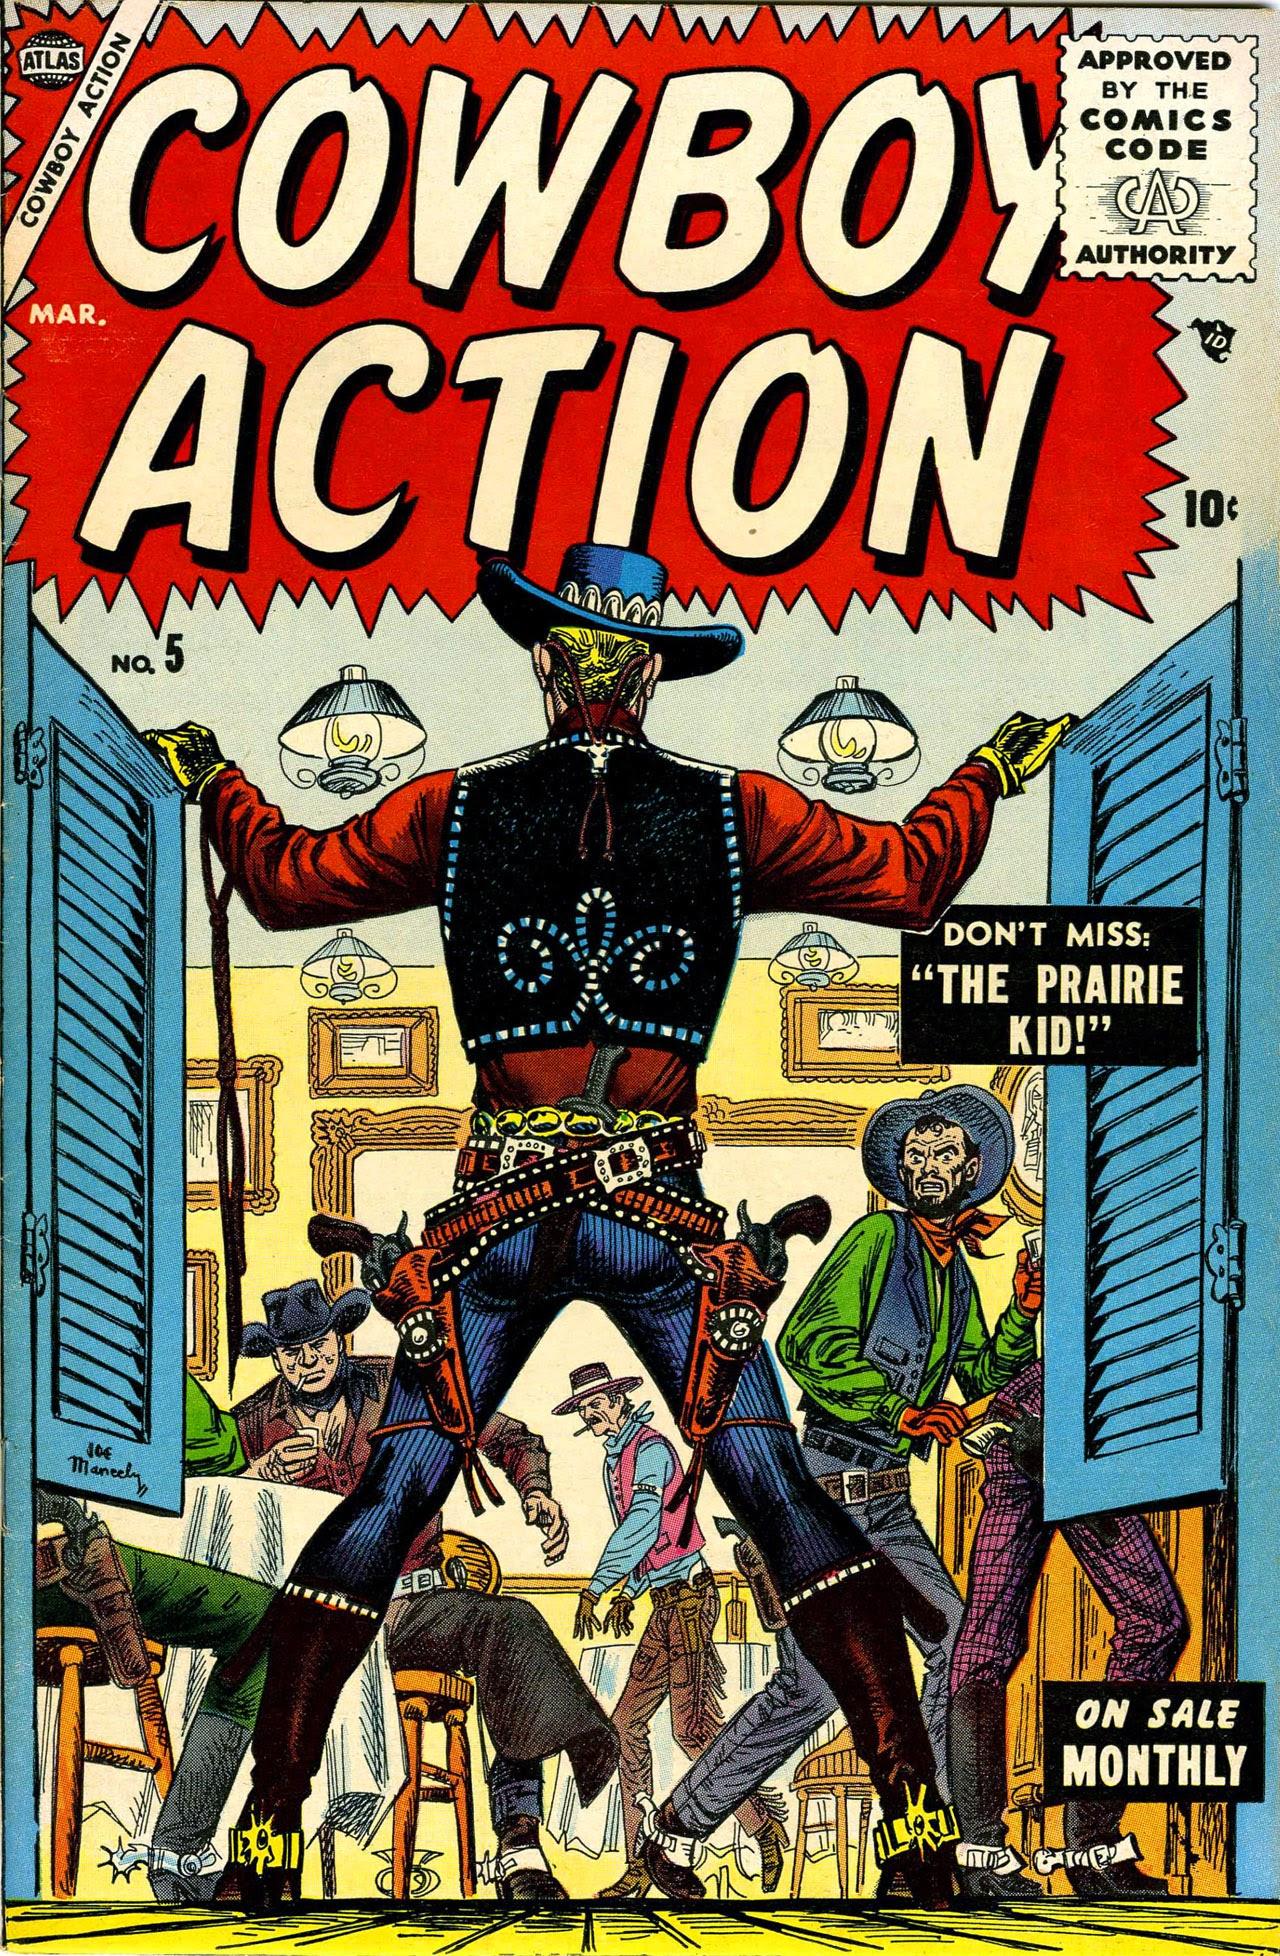 Cowboy Action 5 Page 1